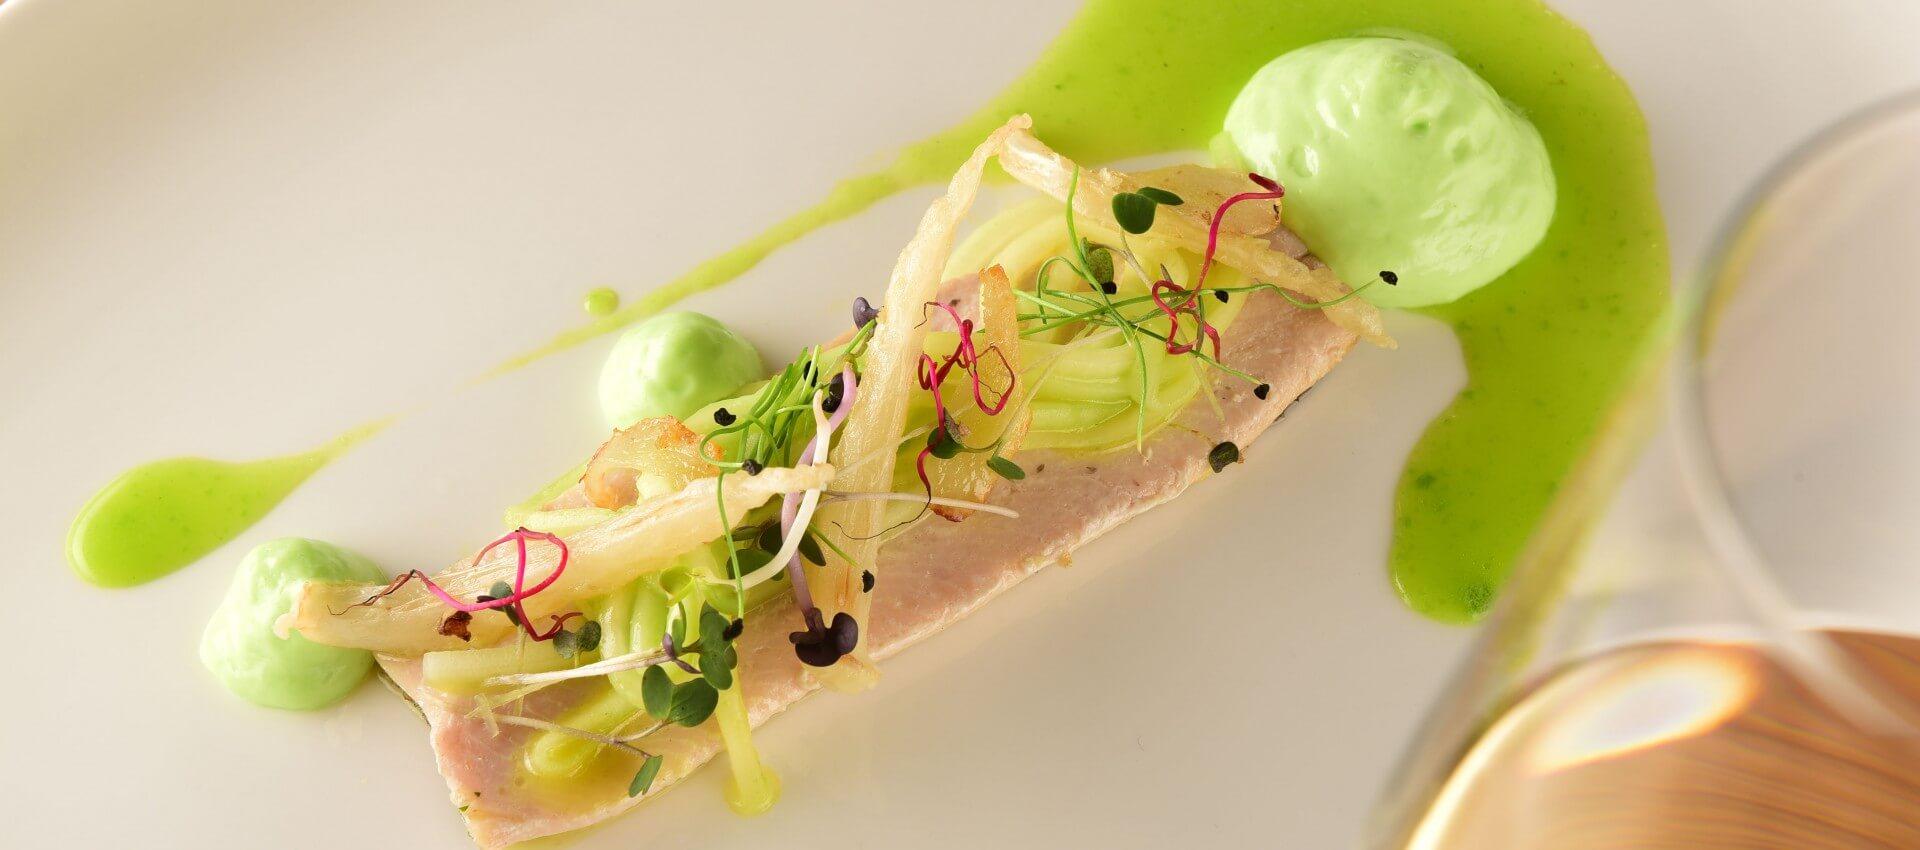 Kulinarik, Gourmethotel in Lana